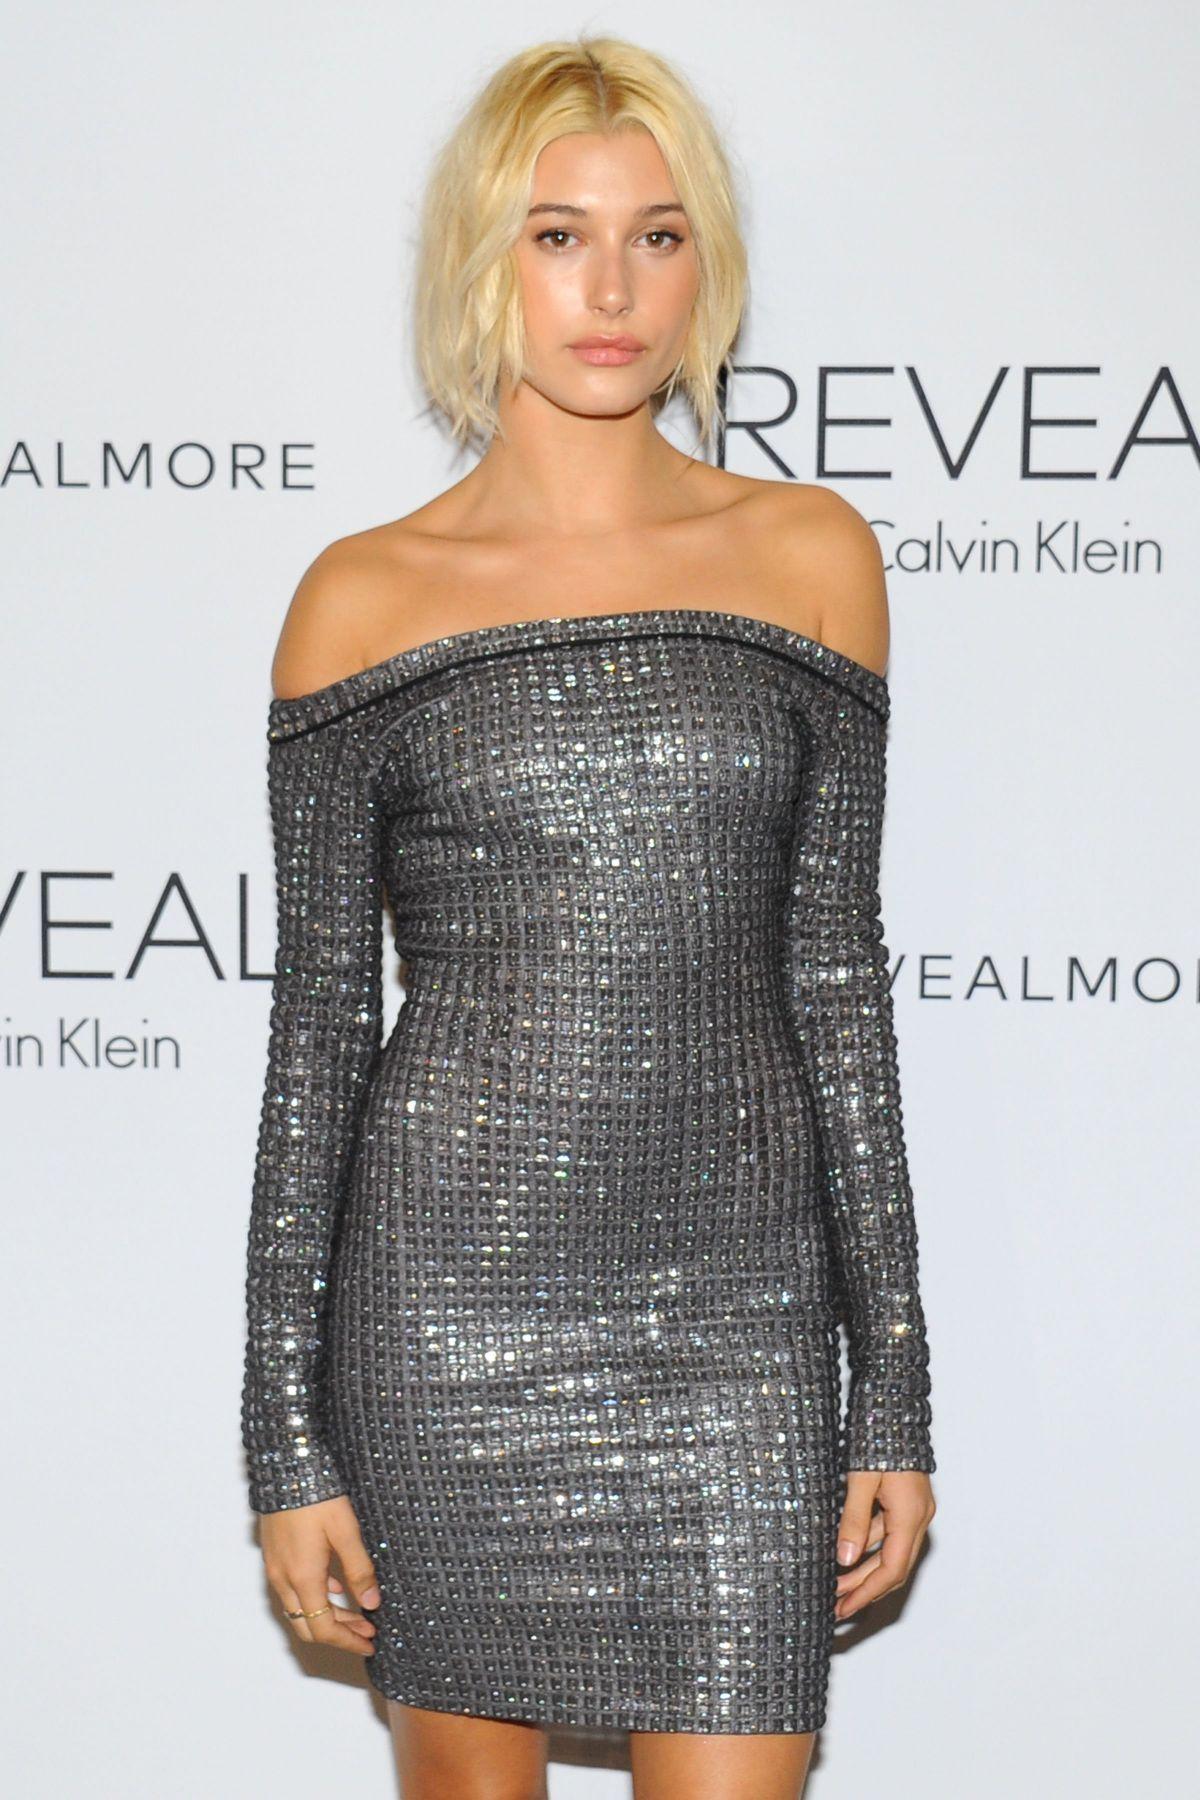 HAILEY BALDWIN at Reveal Calvin Klein Fragrance Launch in New York